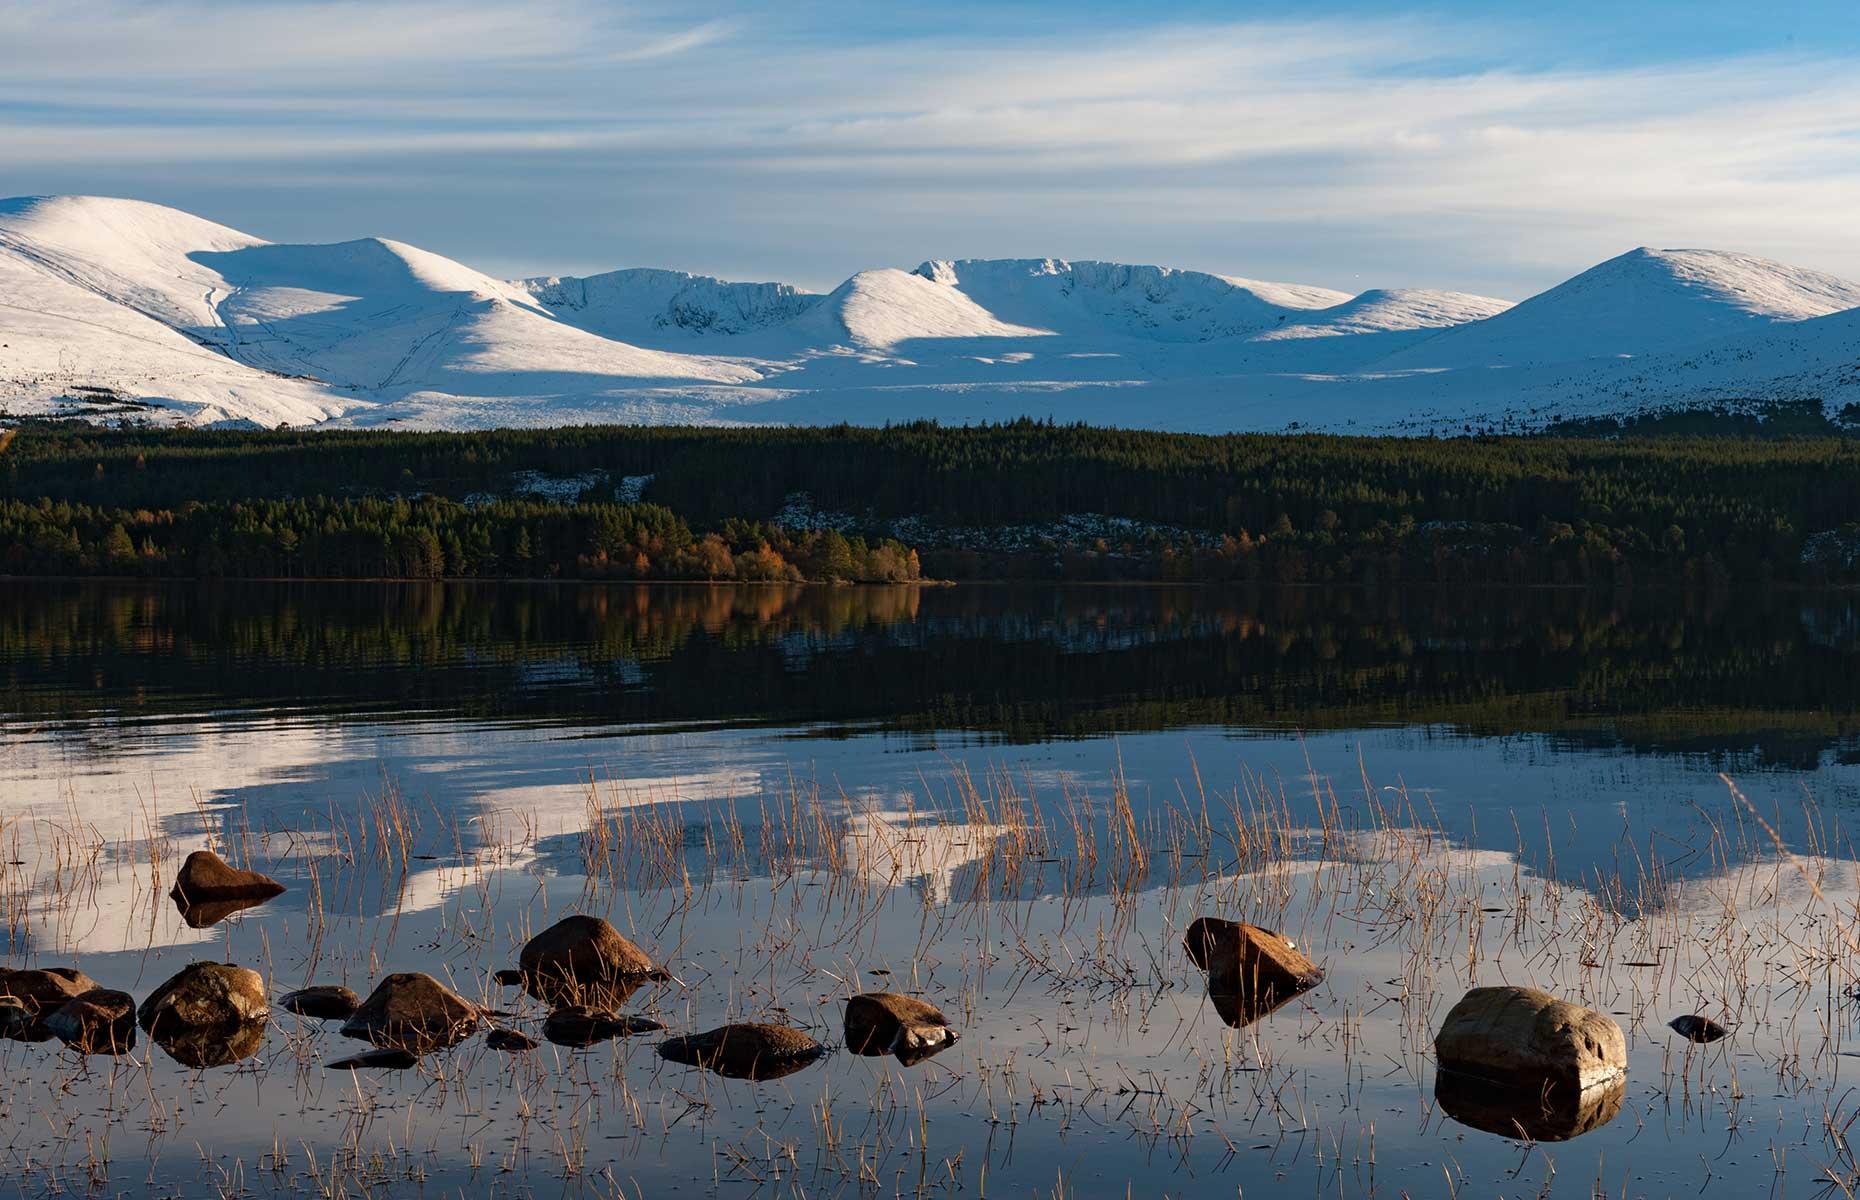 Loch Morlich in Glenmore Forest (Image: Blythe Storm/Shutterstock)